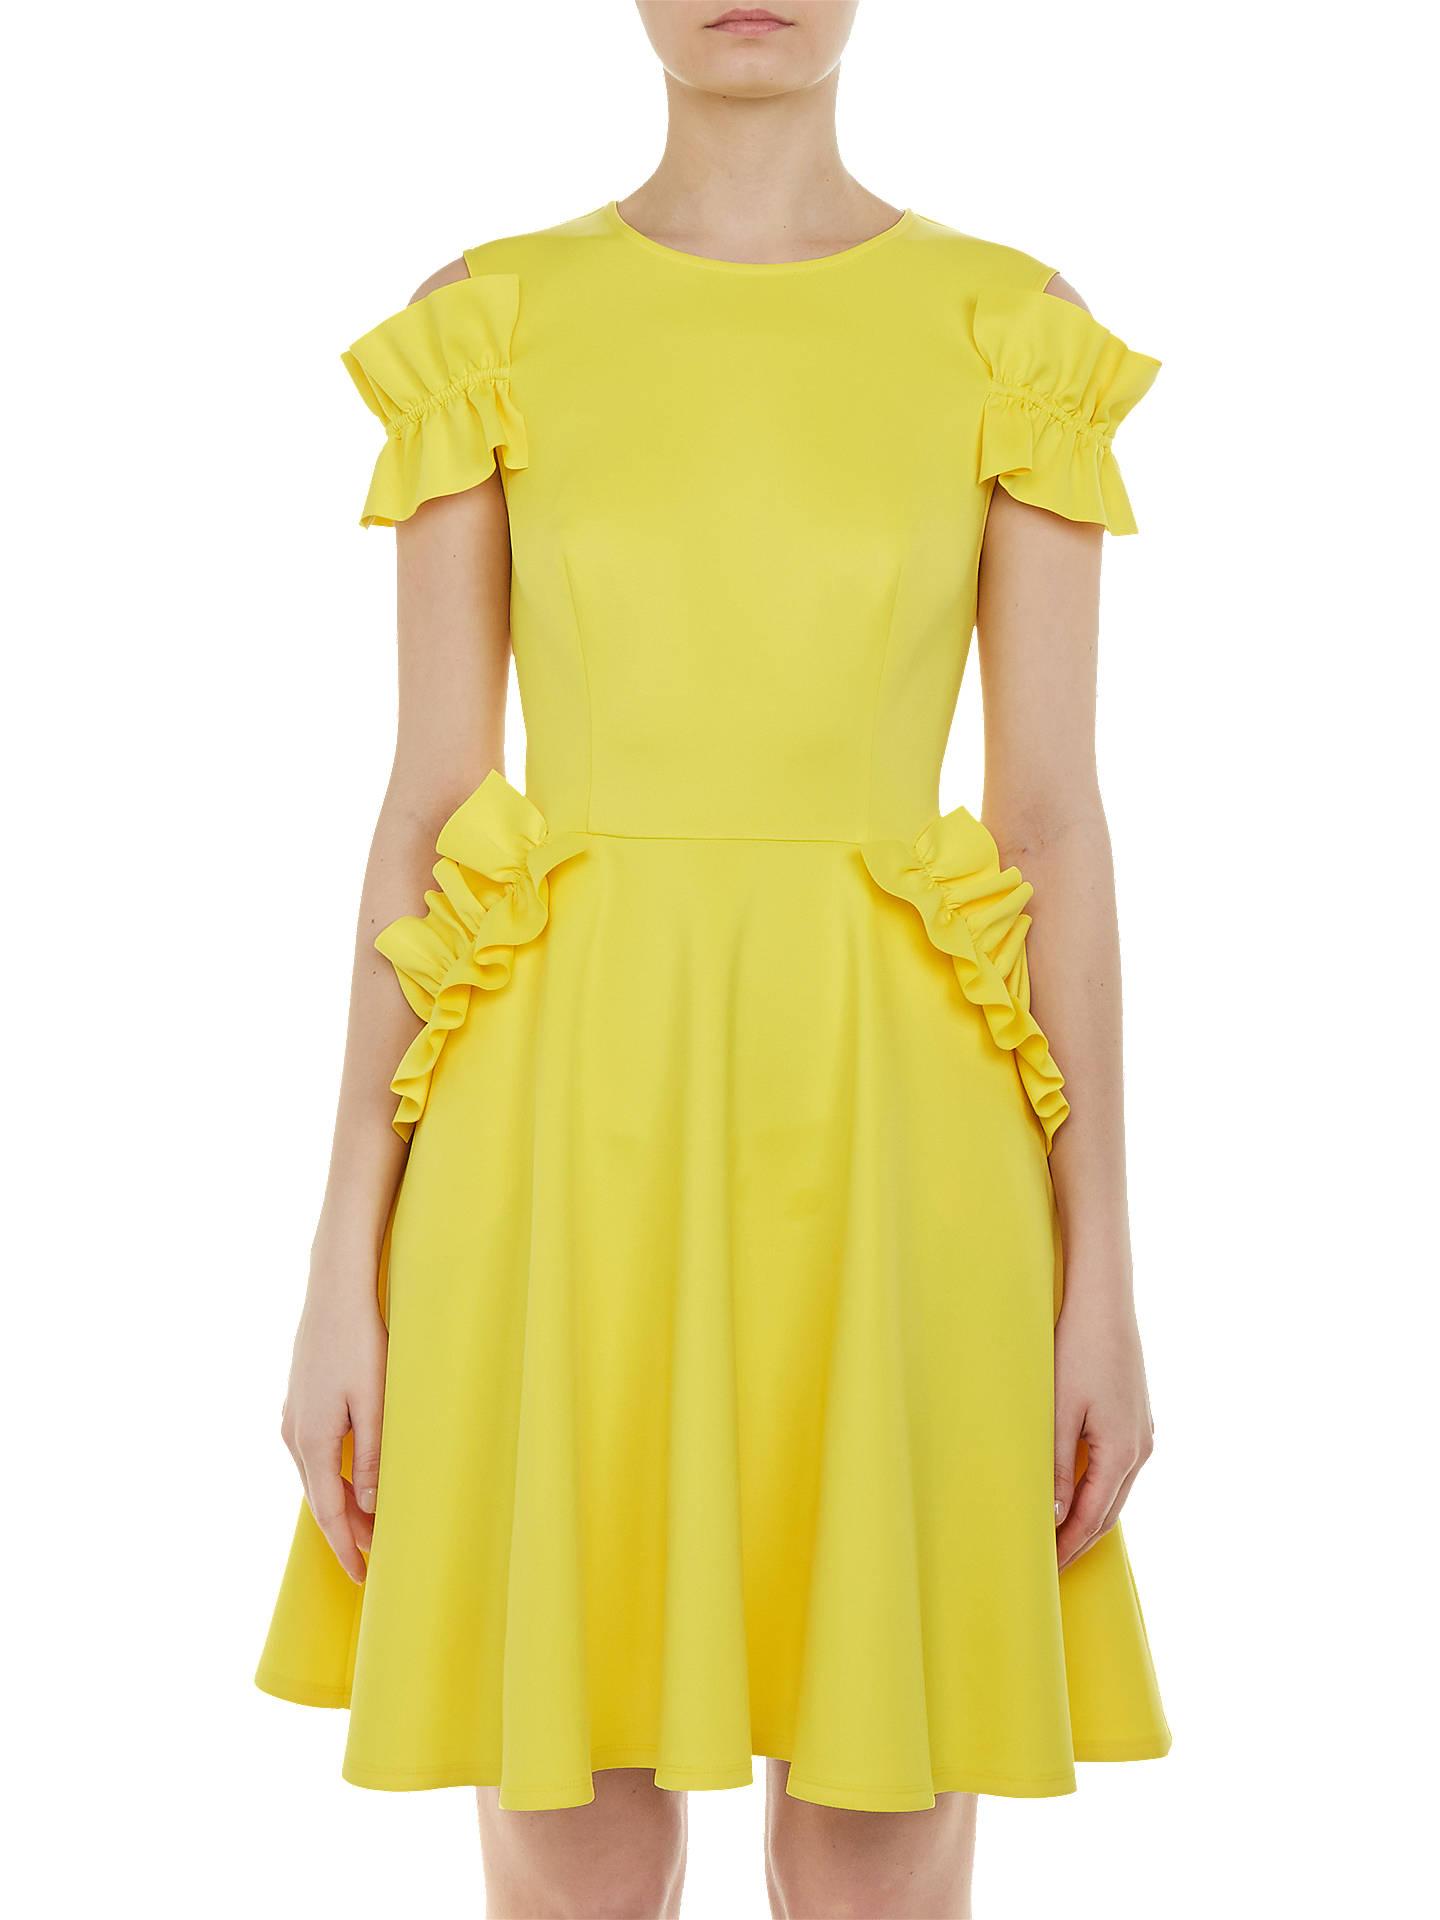 19e135dee2d49 Ted Baker Deneese Ruffle Detail Dress at John Lewis   Partners